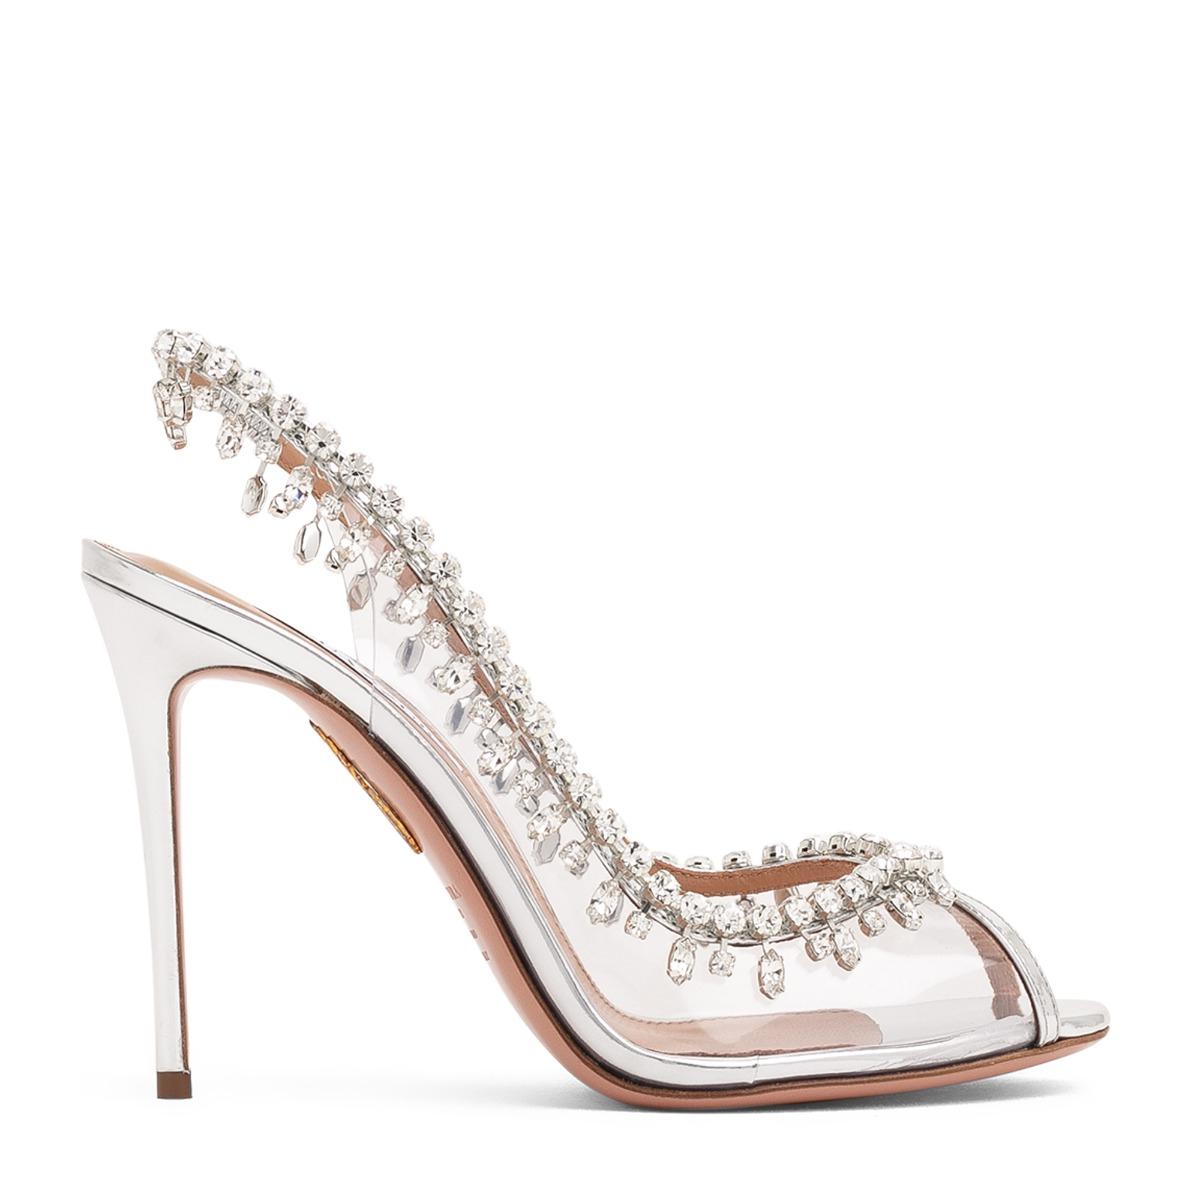 Temptation crystal sandals